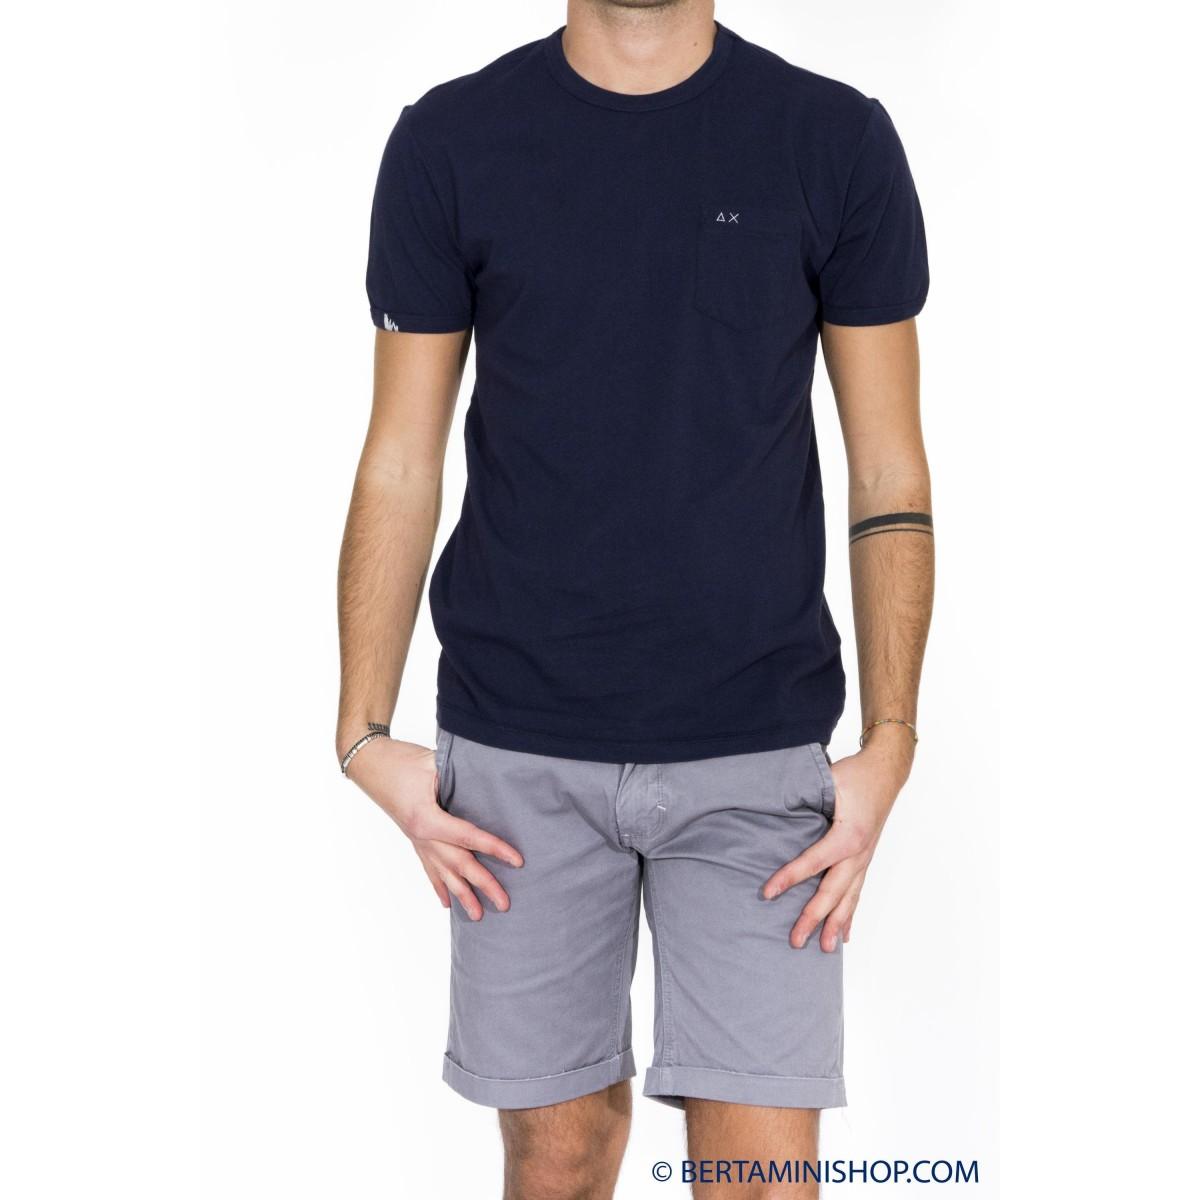 T-shirt uomo Sun 68 - 16120 t-shirt